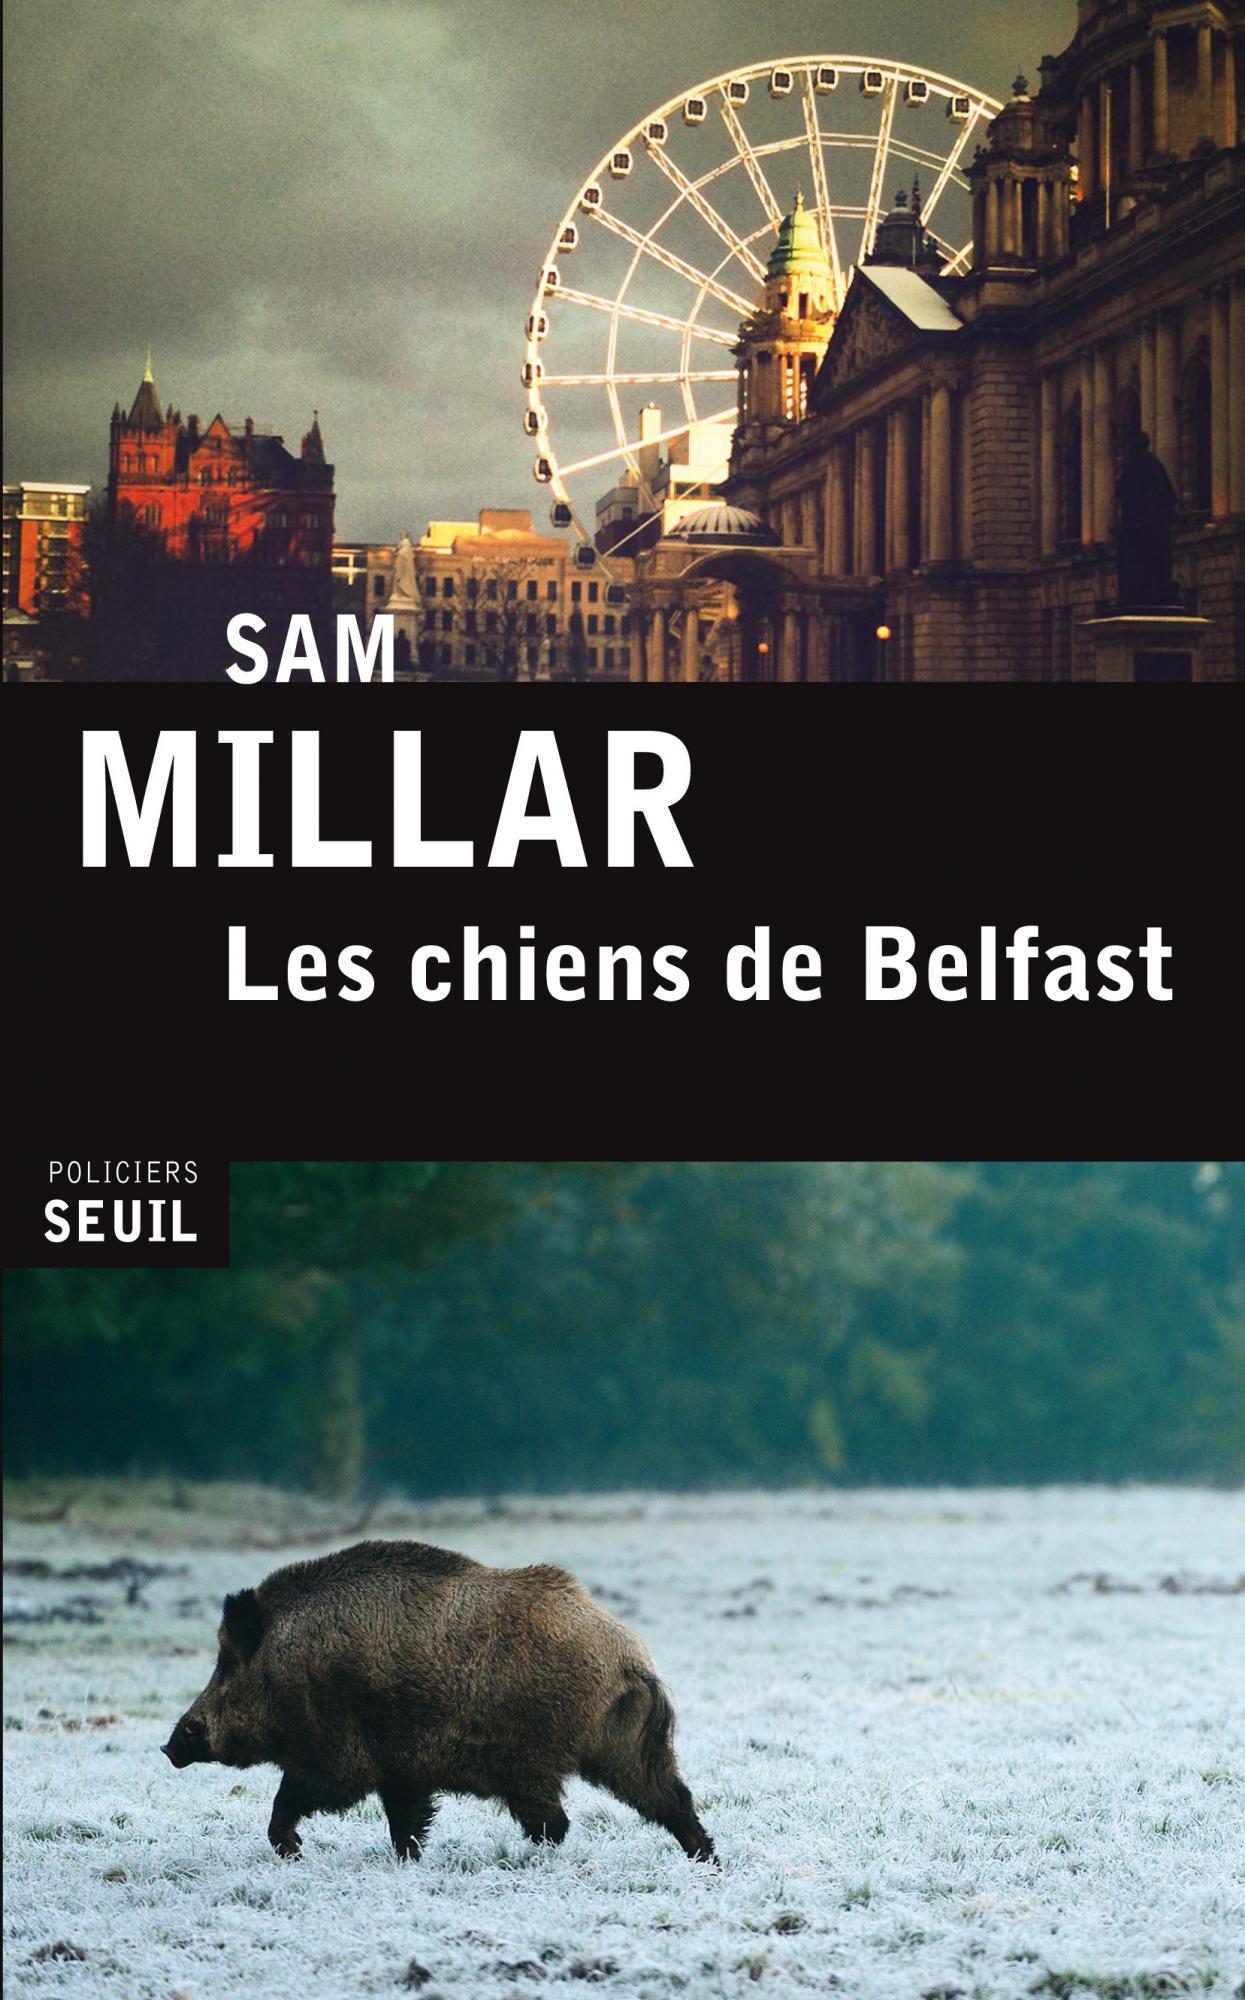 Les chiens de Belfast - Sam Millar